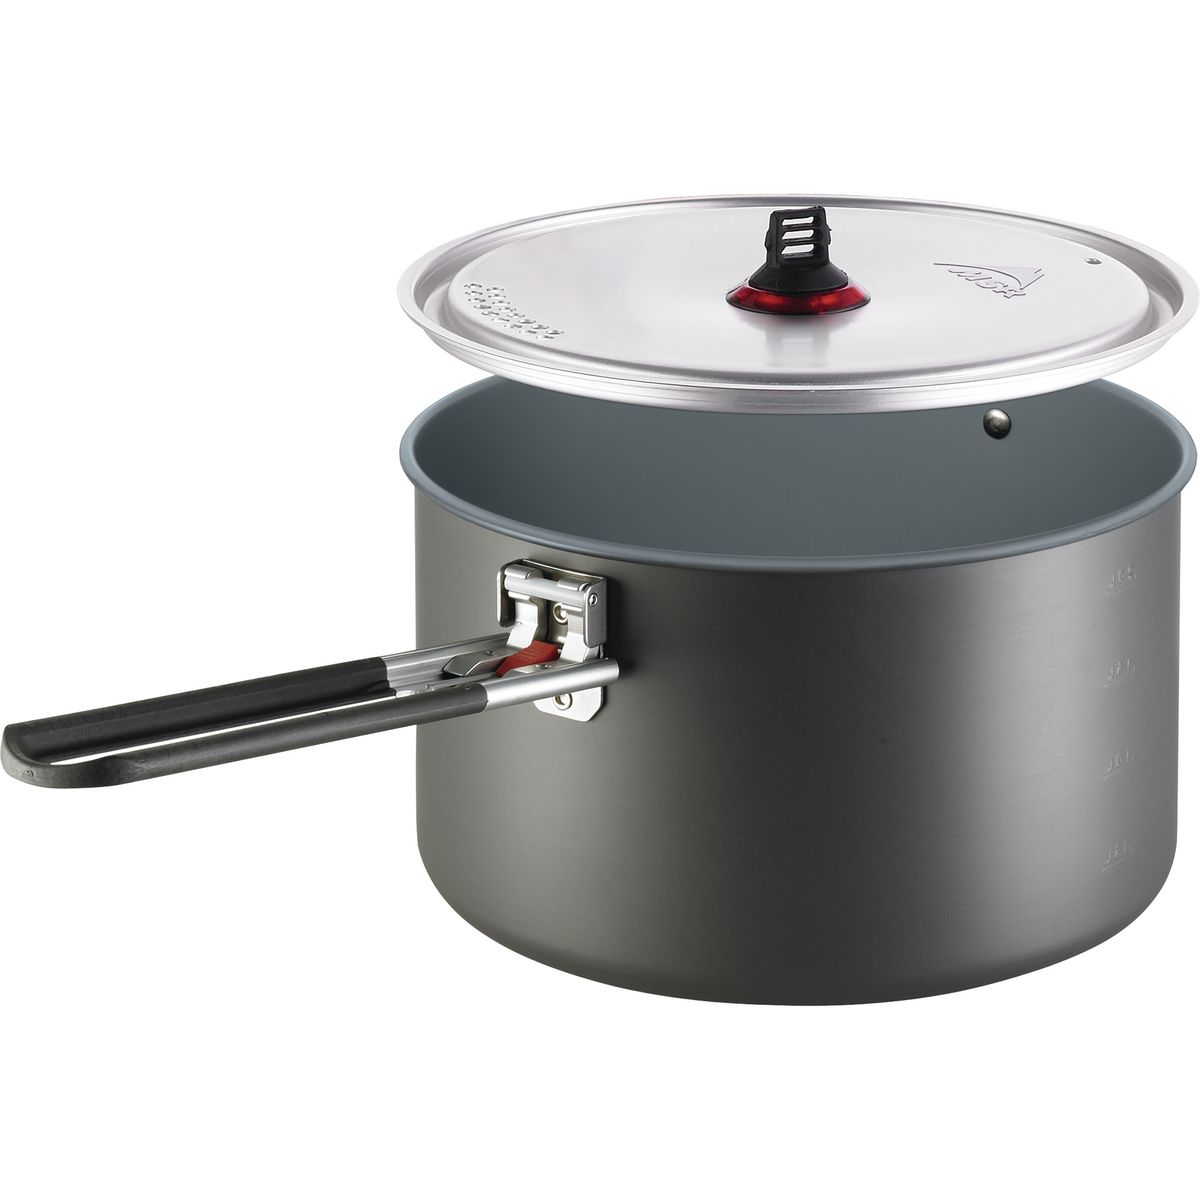 MSR Ceramic 2.5 Liter Pot